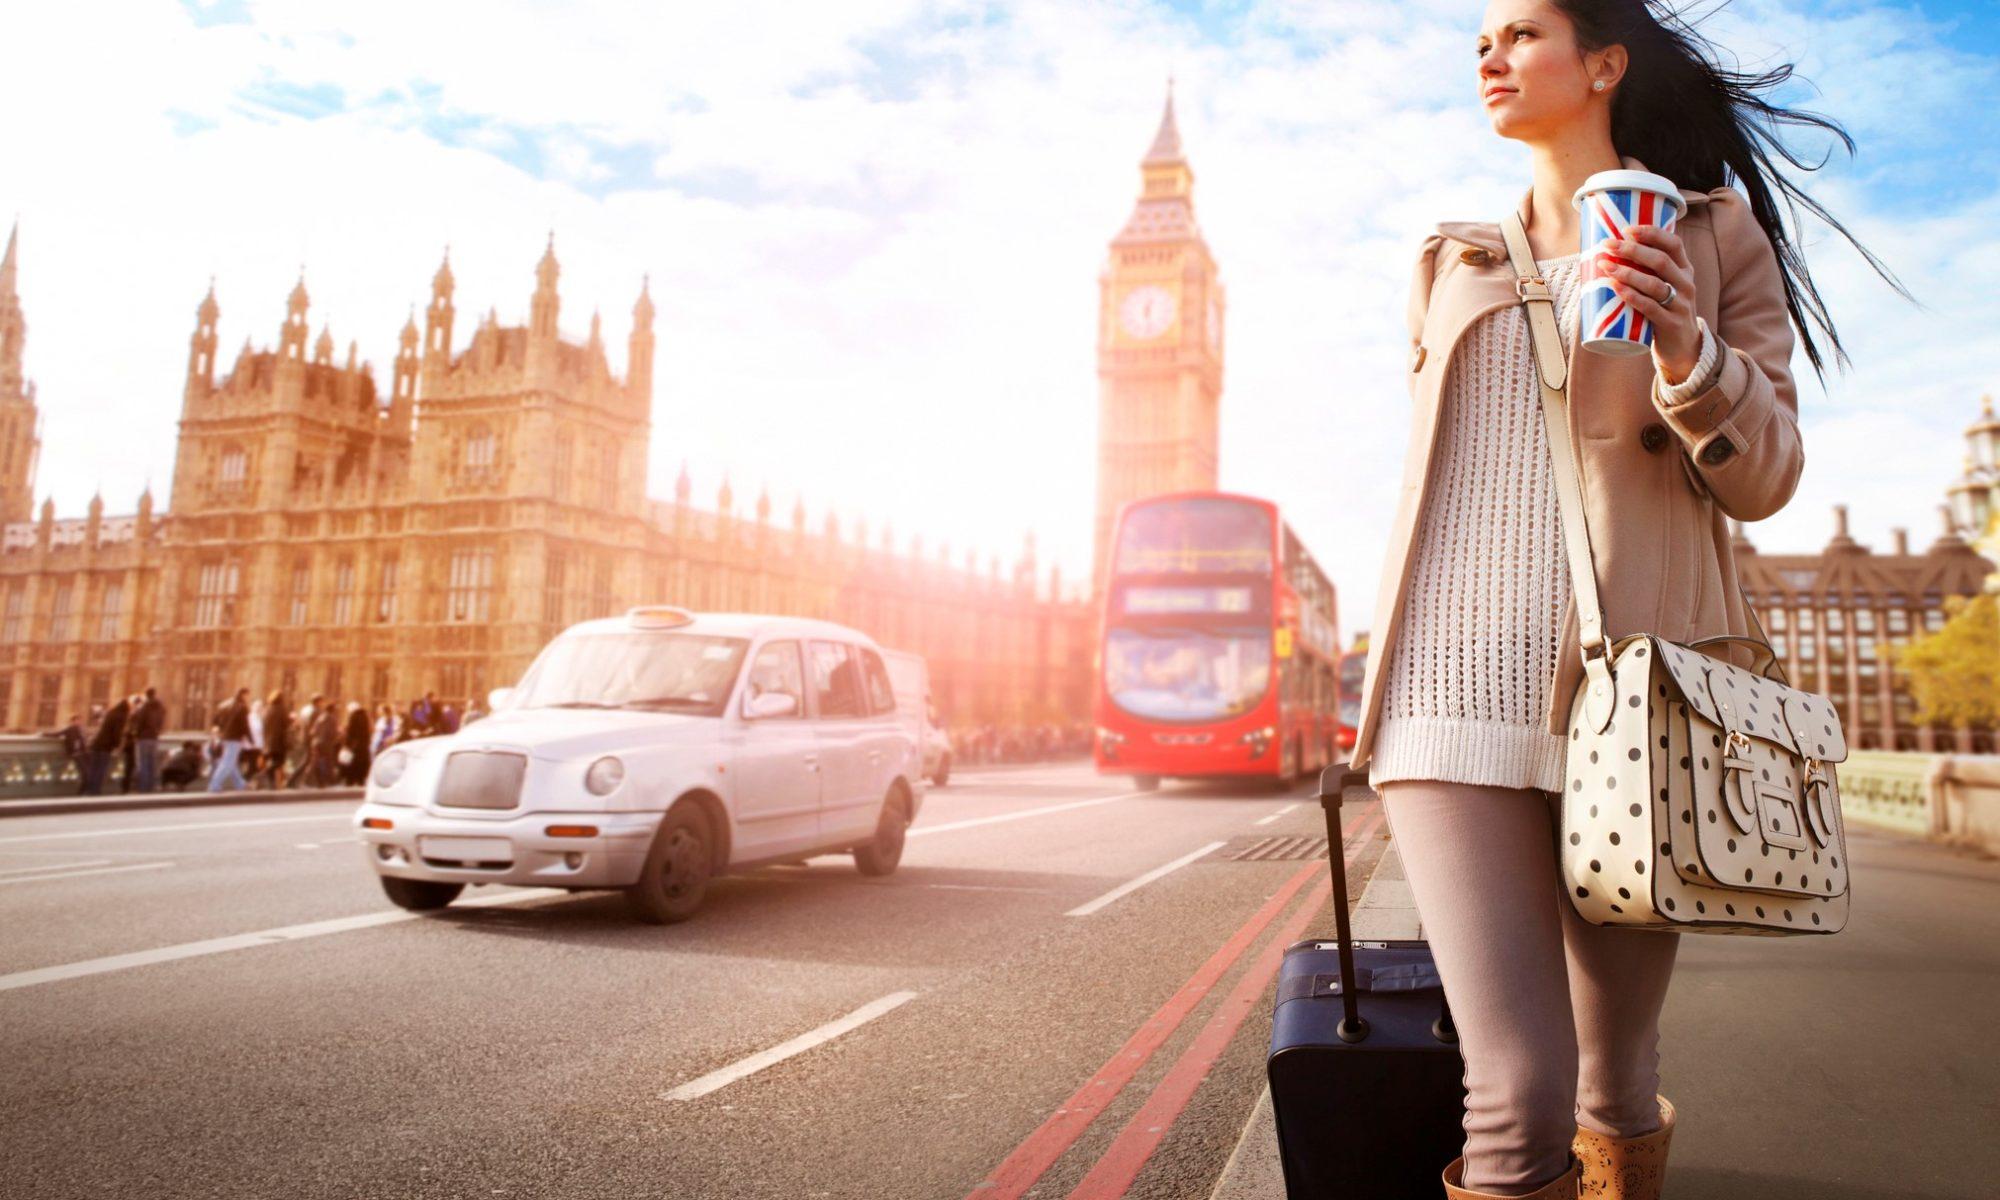 United Kingdom Outbound Tourism Market Size, Status, and Forecast